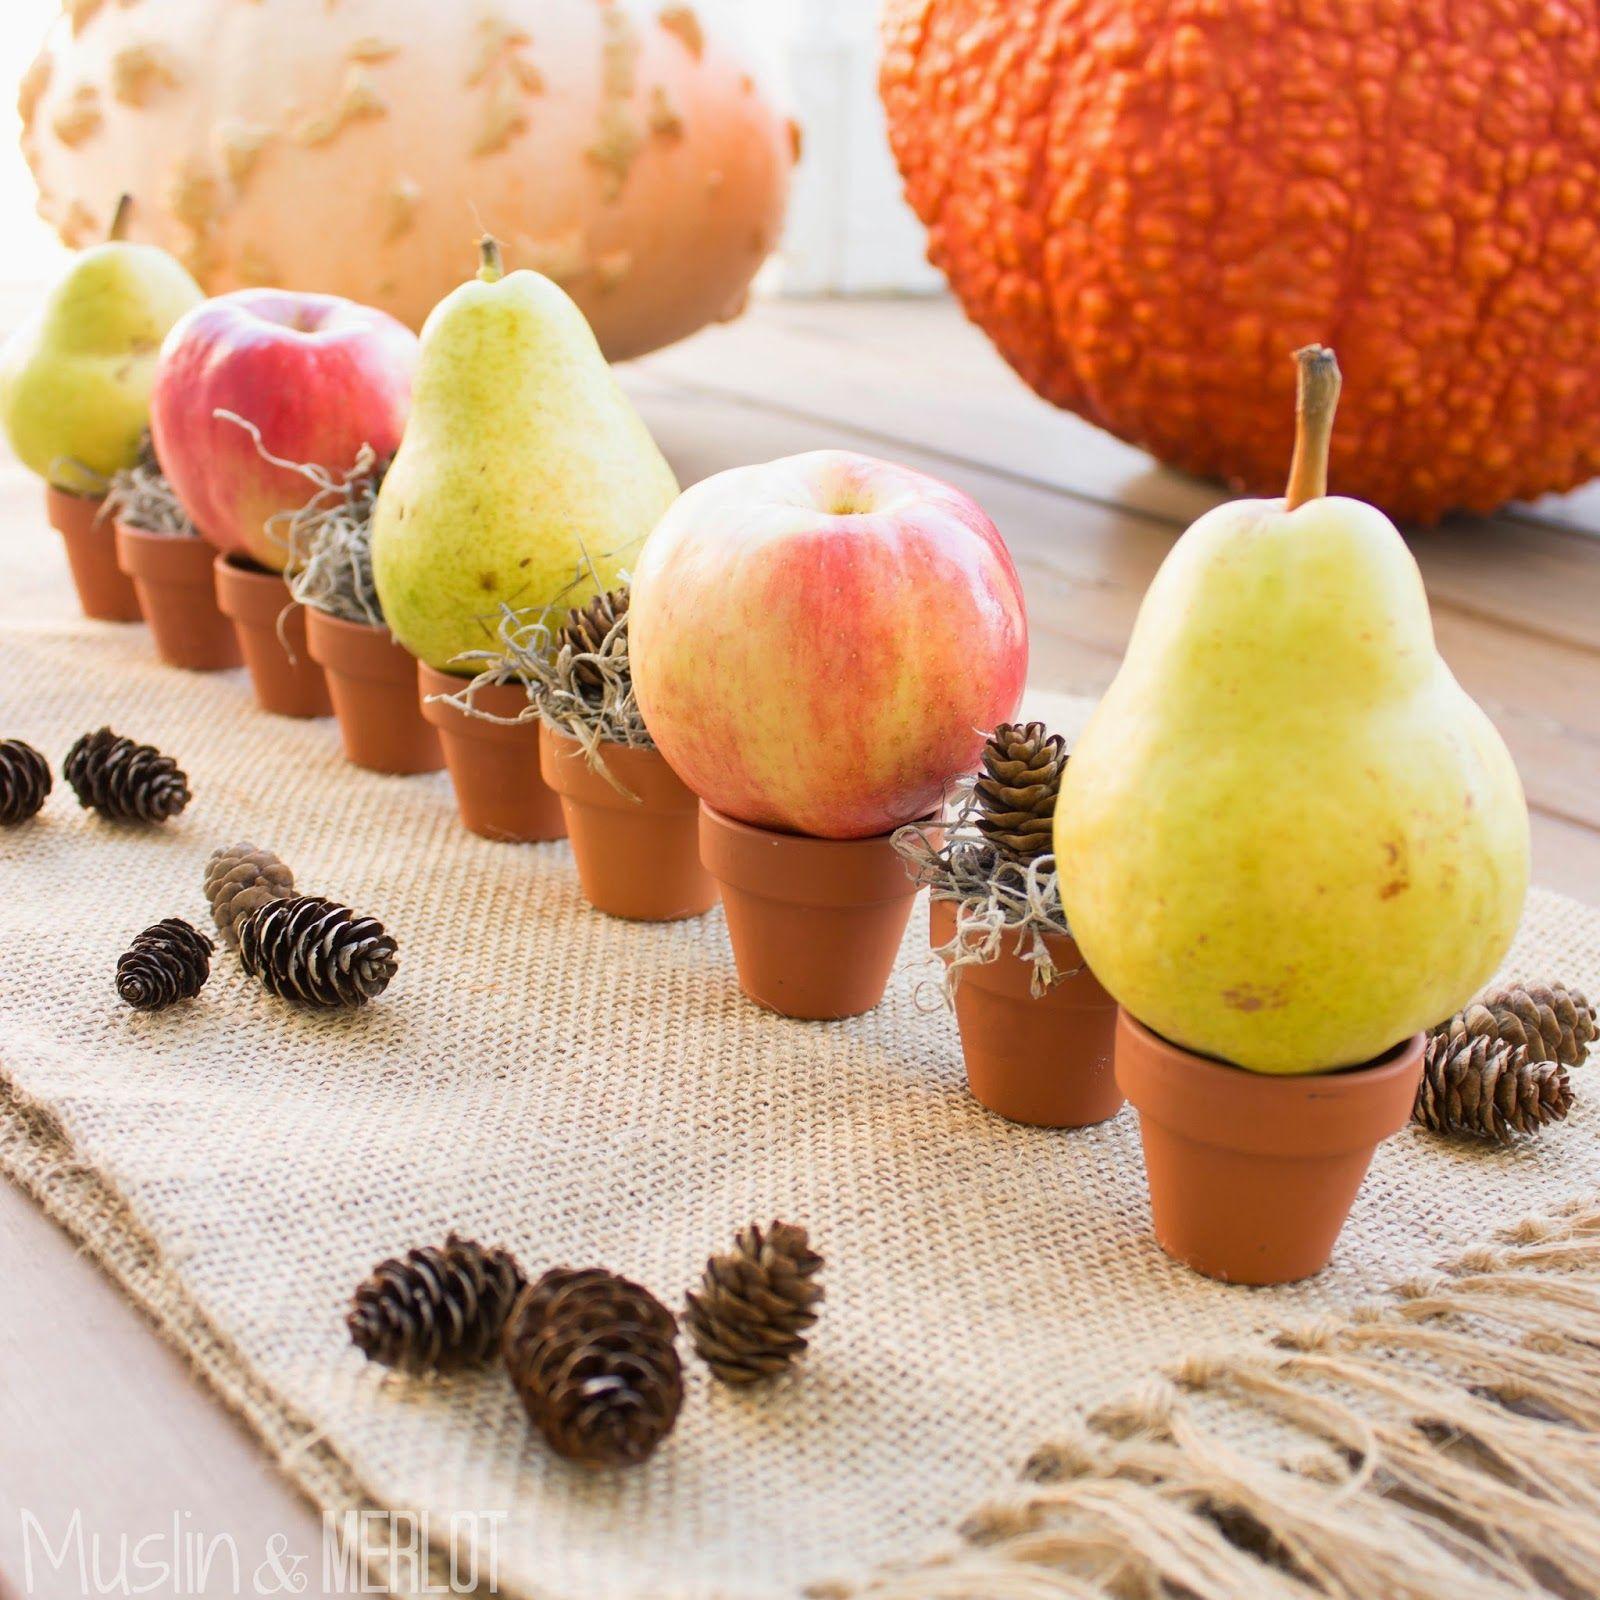 Edited Fruit Basket - Easy Rustic Fall Centerpiece!